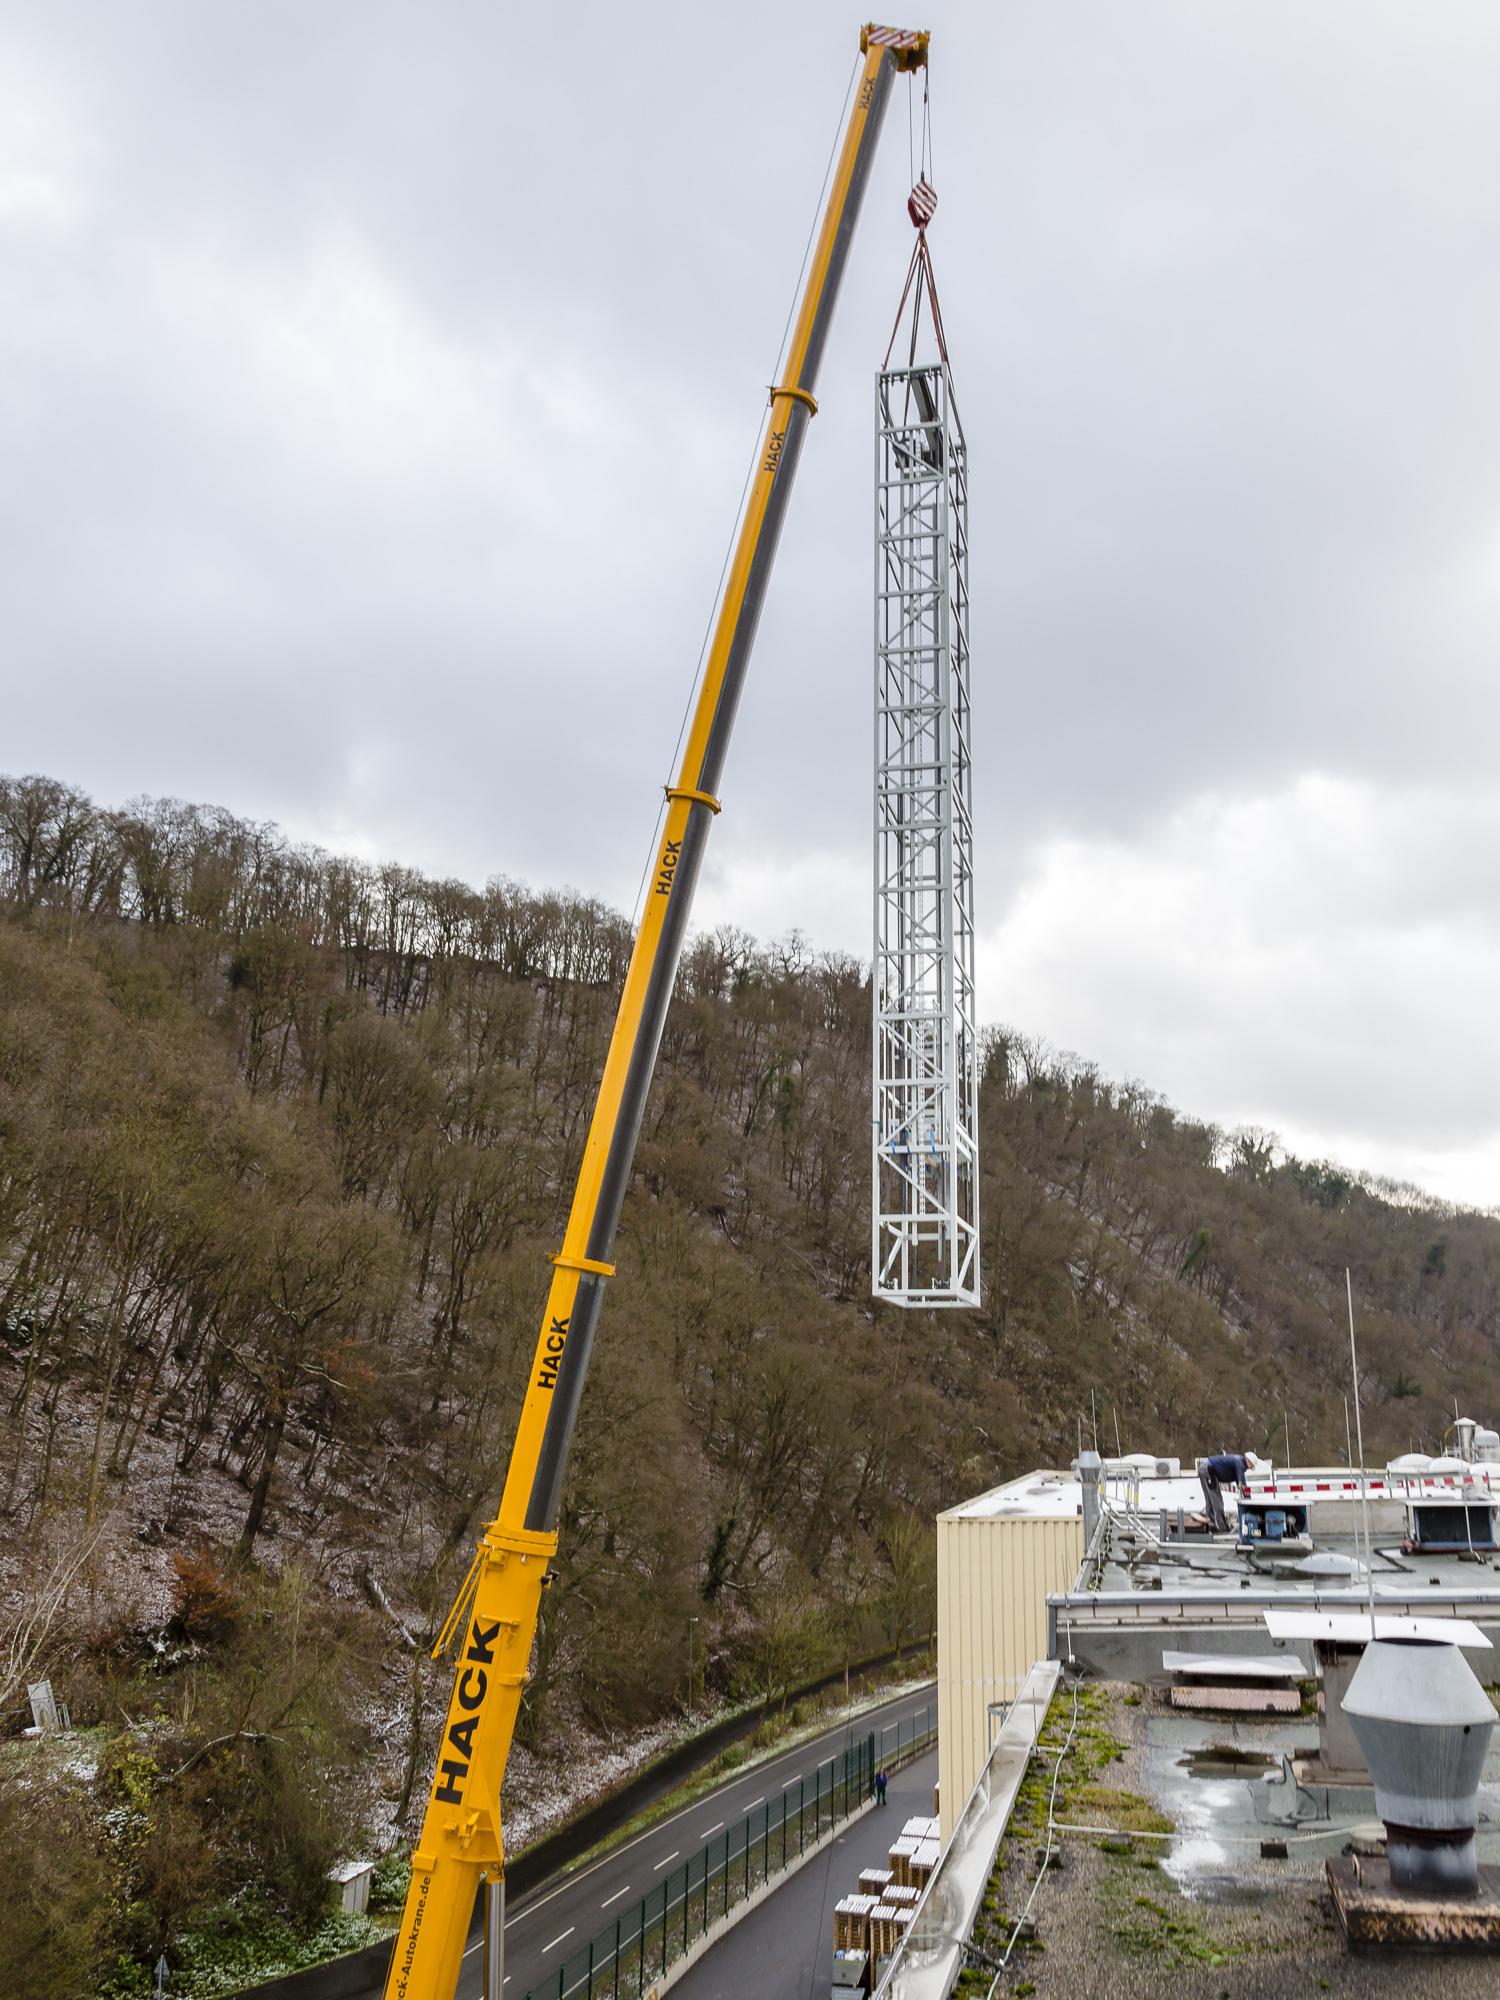 180328-Clariant-23m-Vertikalfoerderer--Verfahrwagen-Fahrstuhlschacht-15.jpg